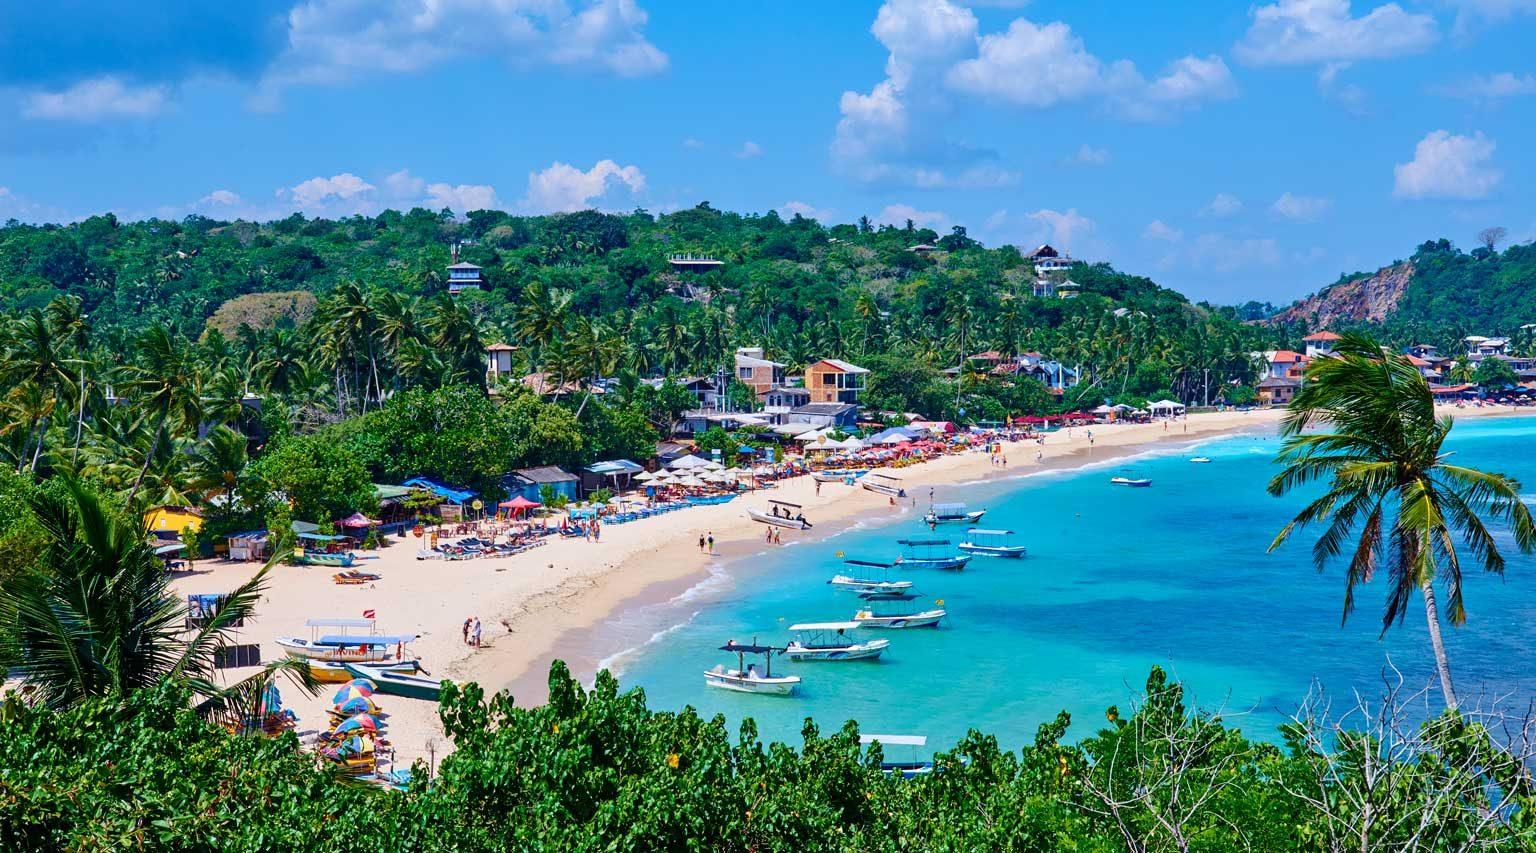 Sri Lanka, Southern Province, South Coast beach, Galle district, Unawatuna beach